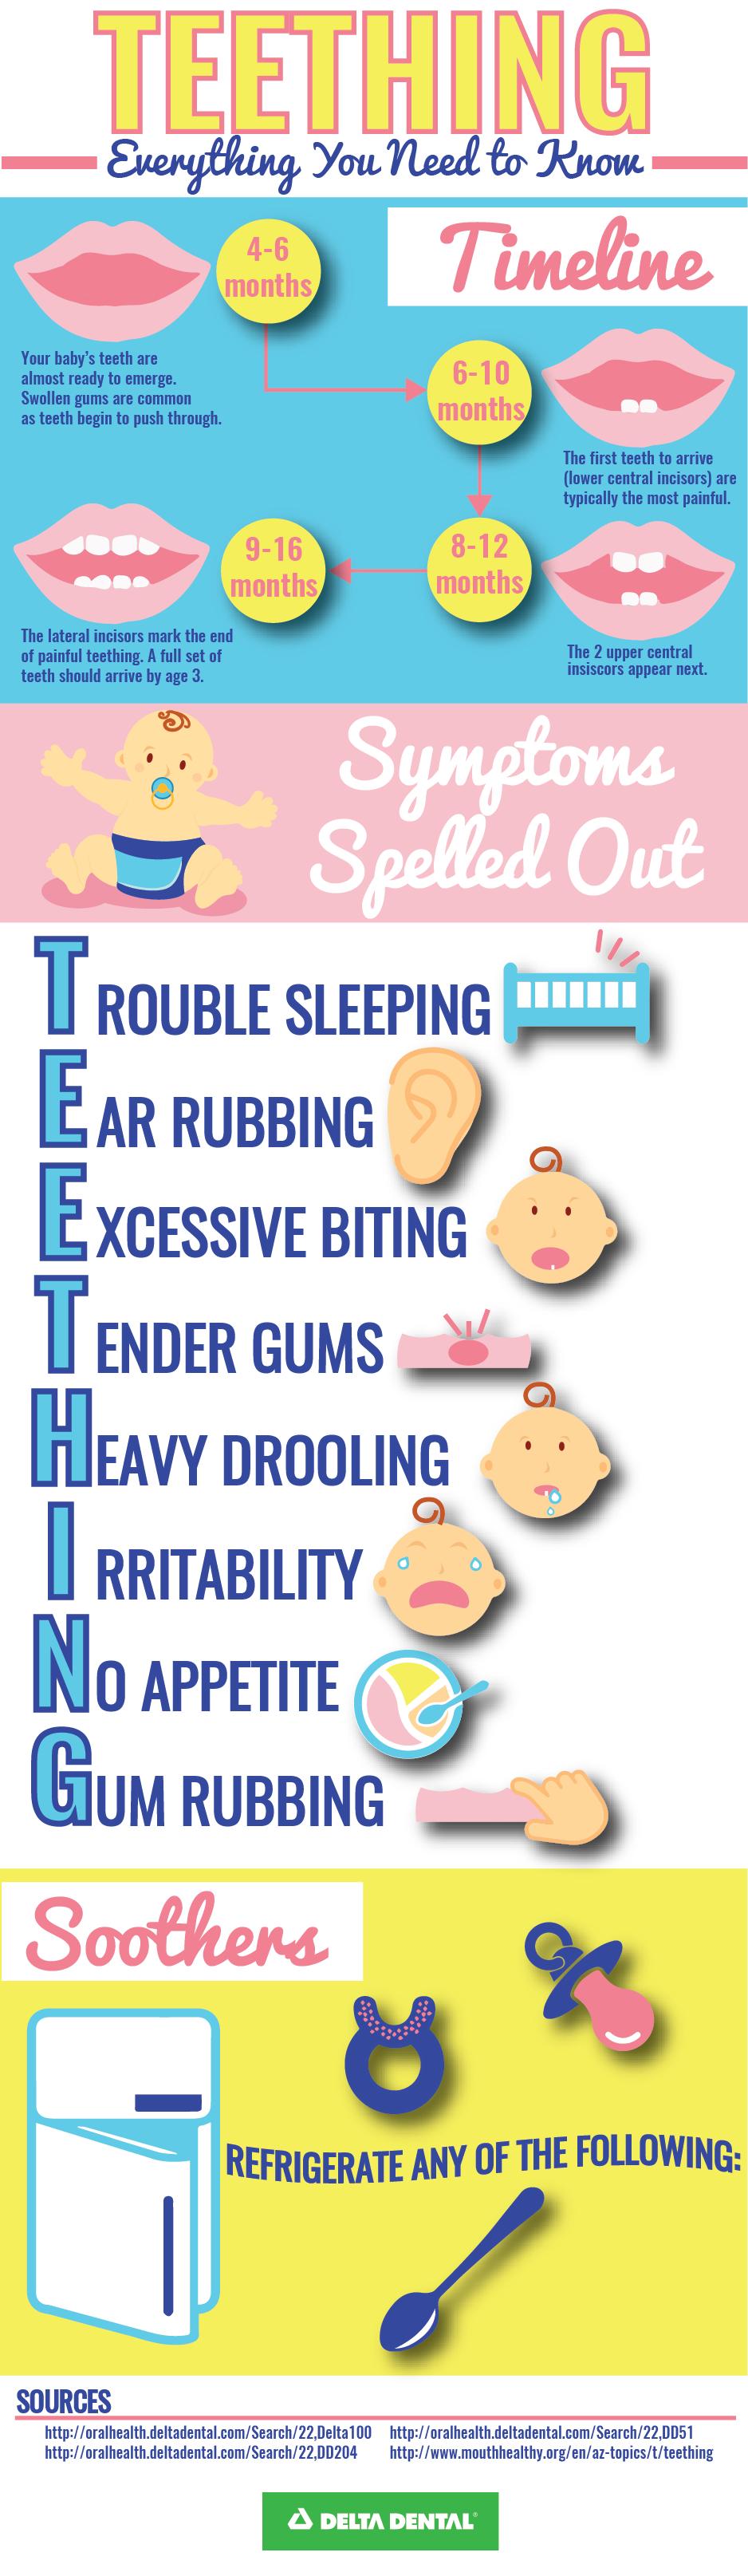 Typical Teething Timeline